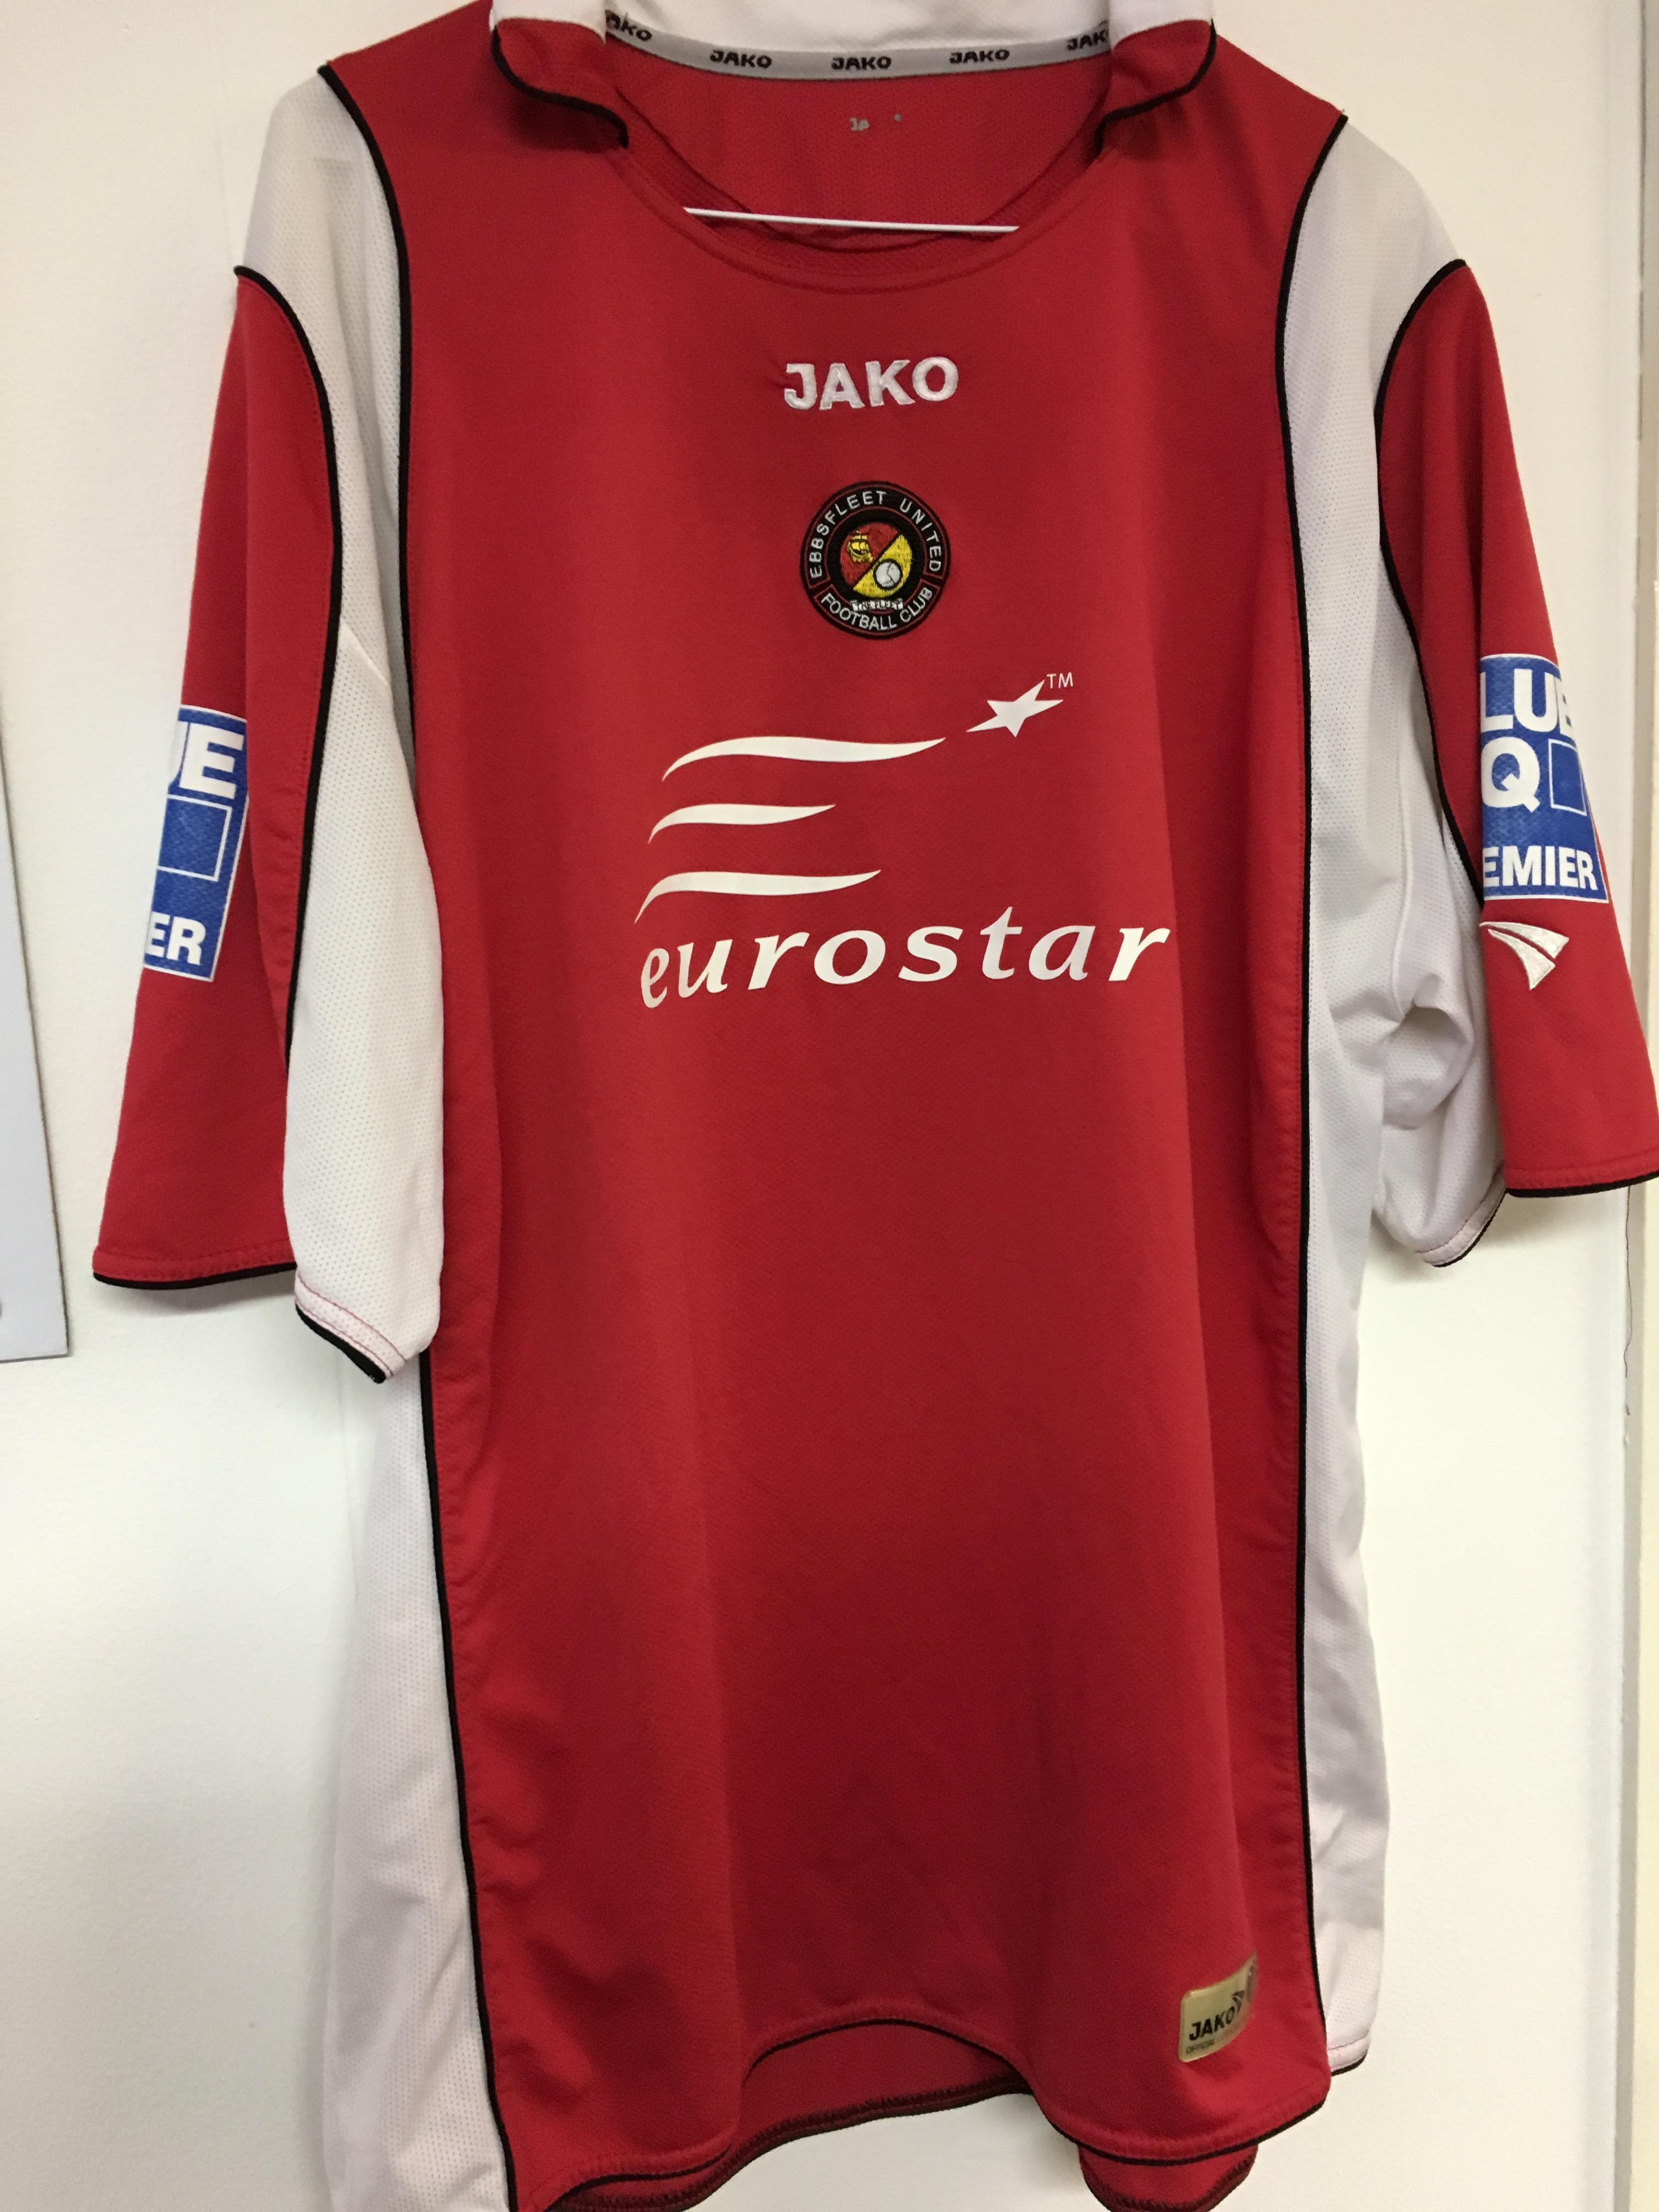 Eurostar was Ebbsfleet's shirt sponsor between 2007 and 2011